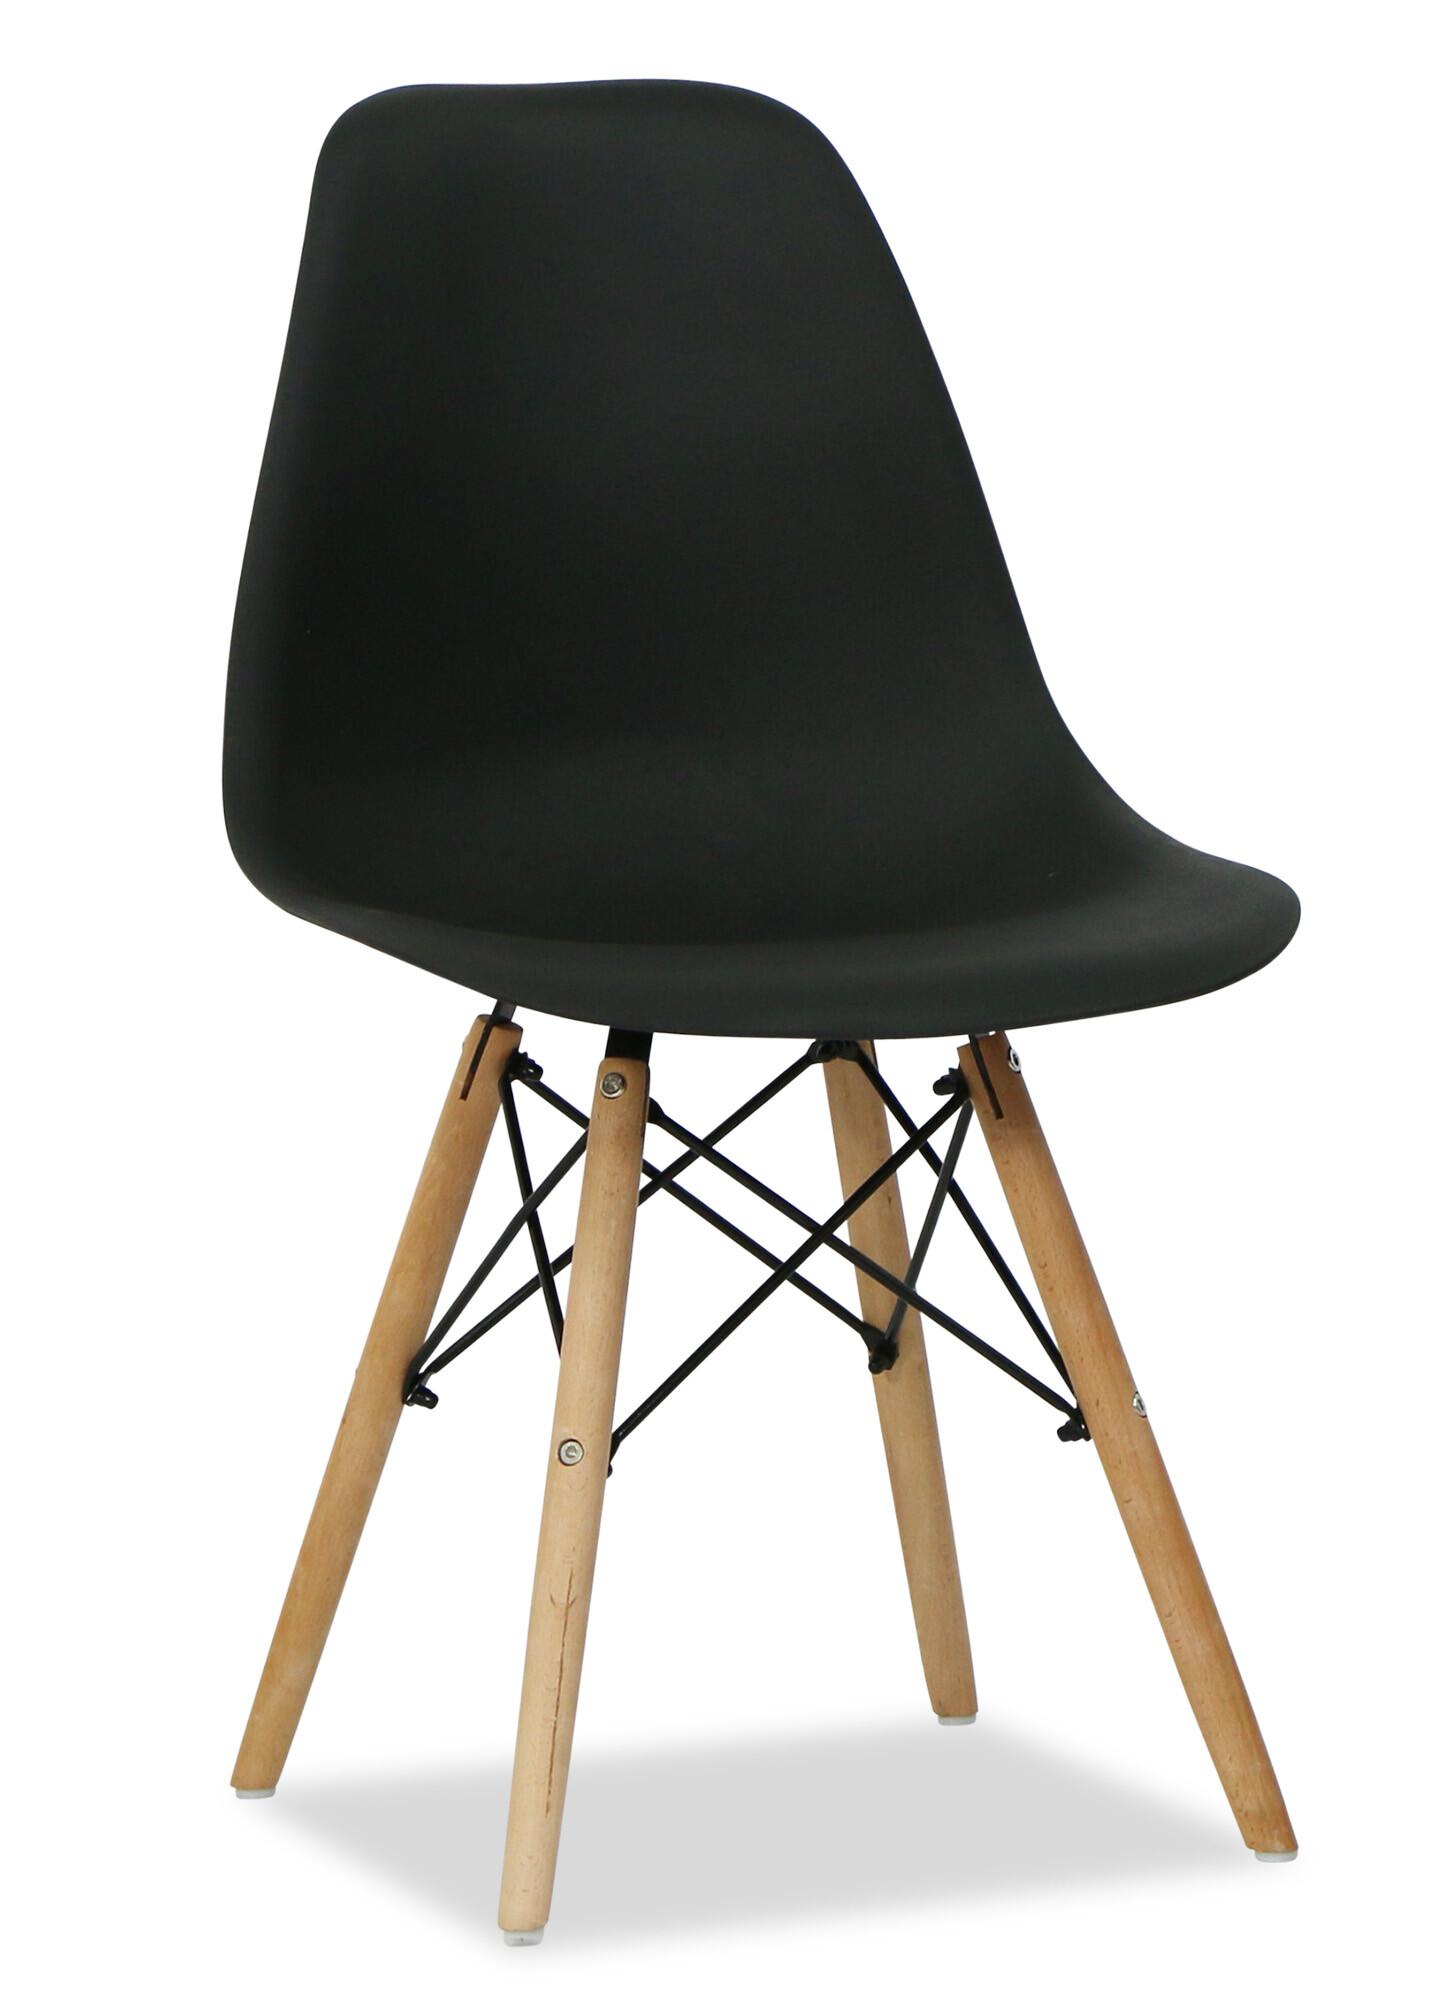 Eames Design Chair Interior Design Amp Decorating Ideas